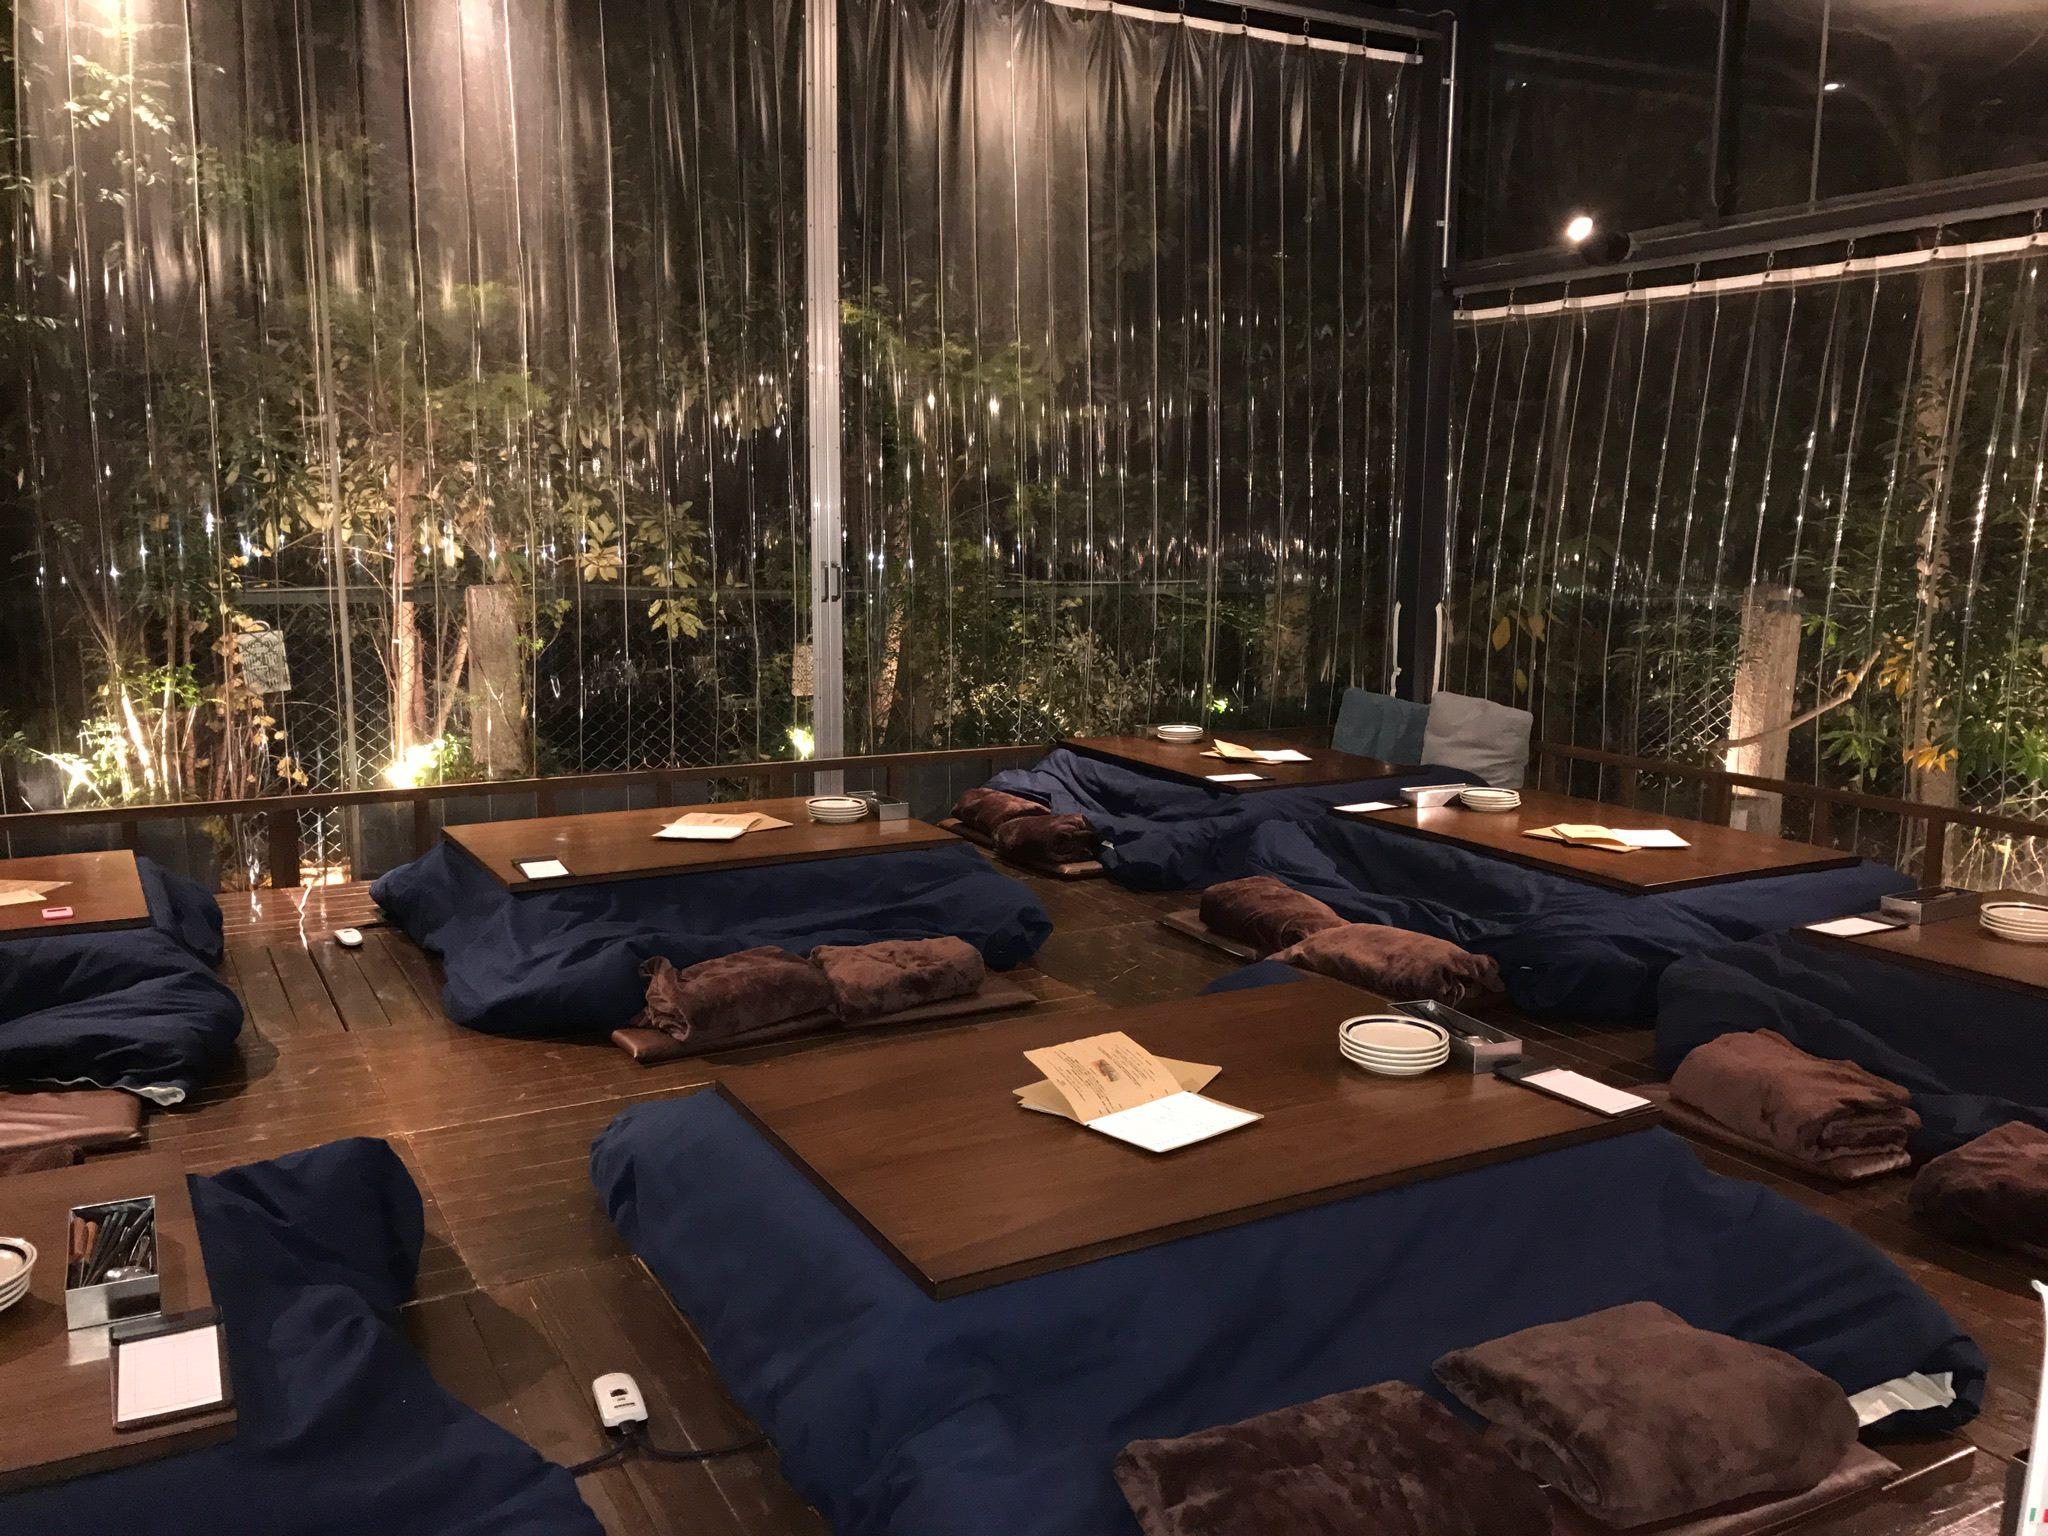 tokyo cafes ryogoku